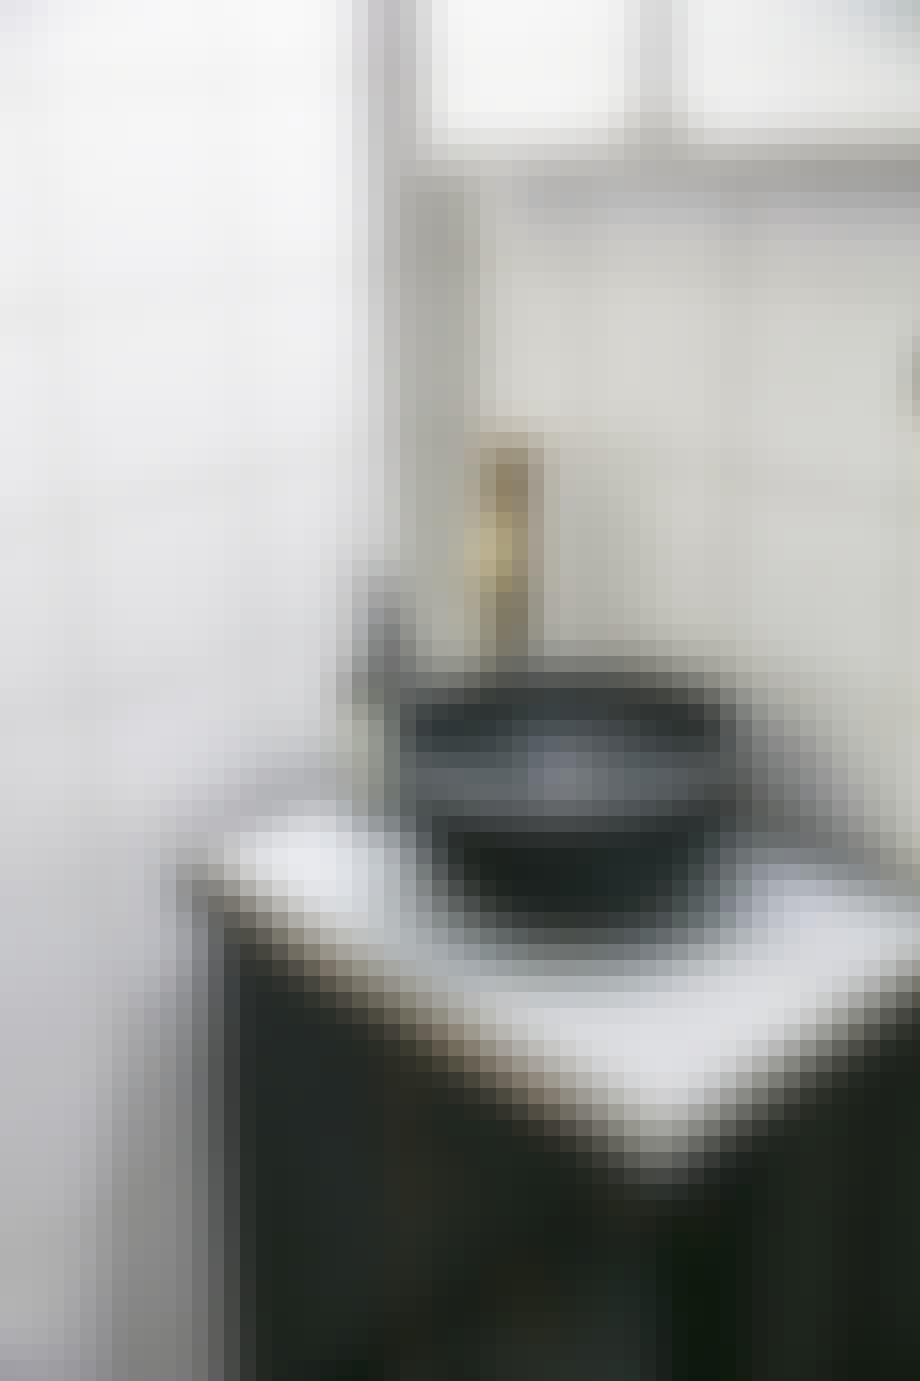 boligreportage boligindreting badeværelse vask